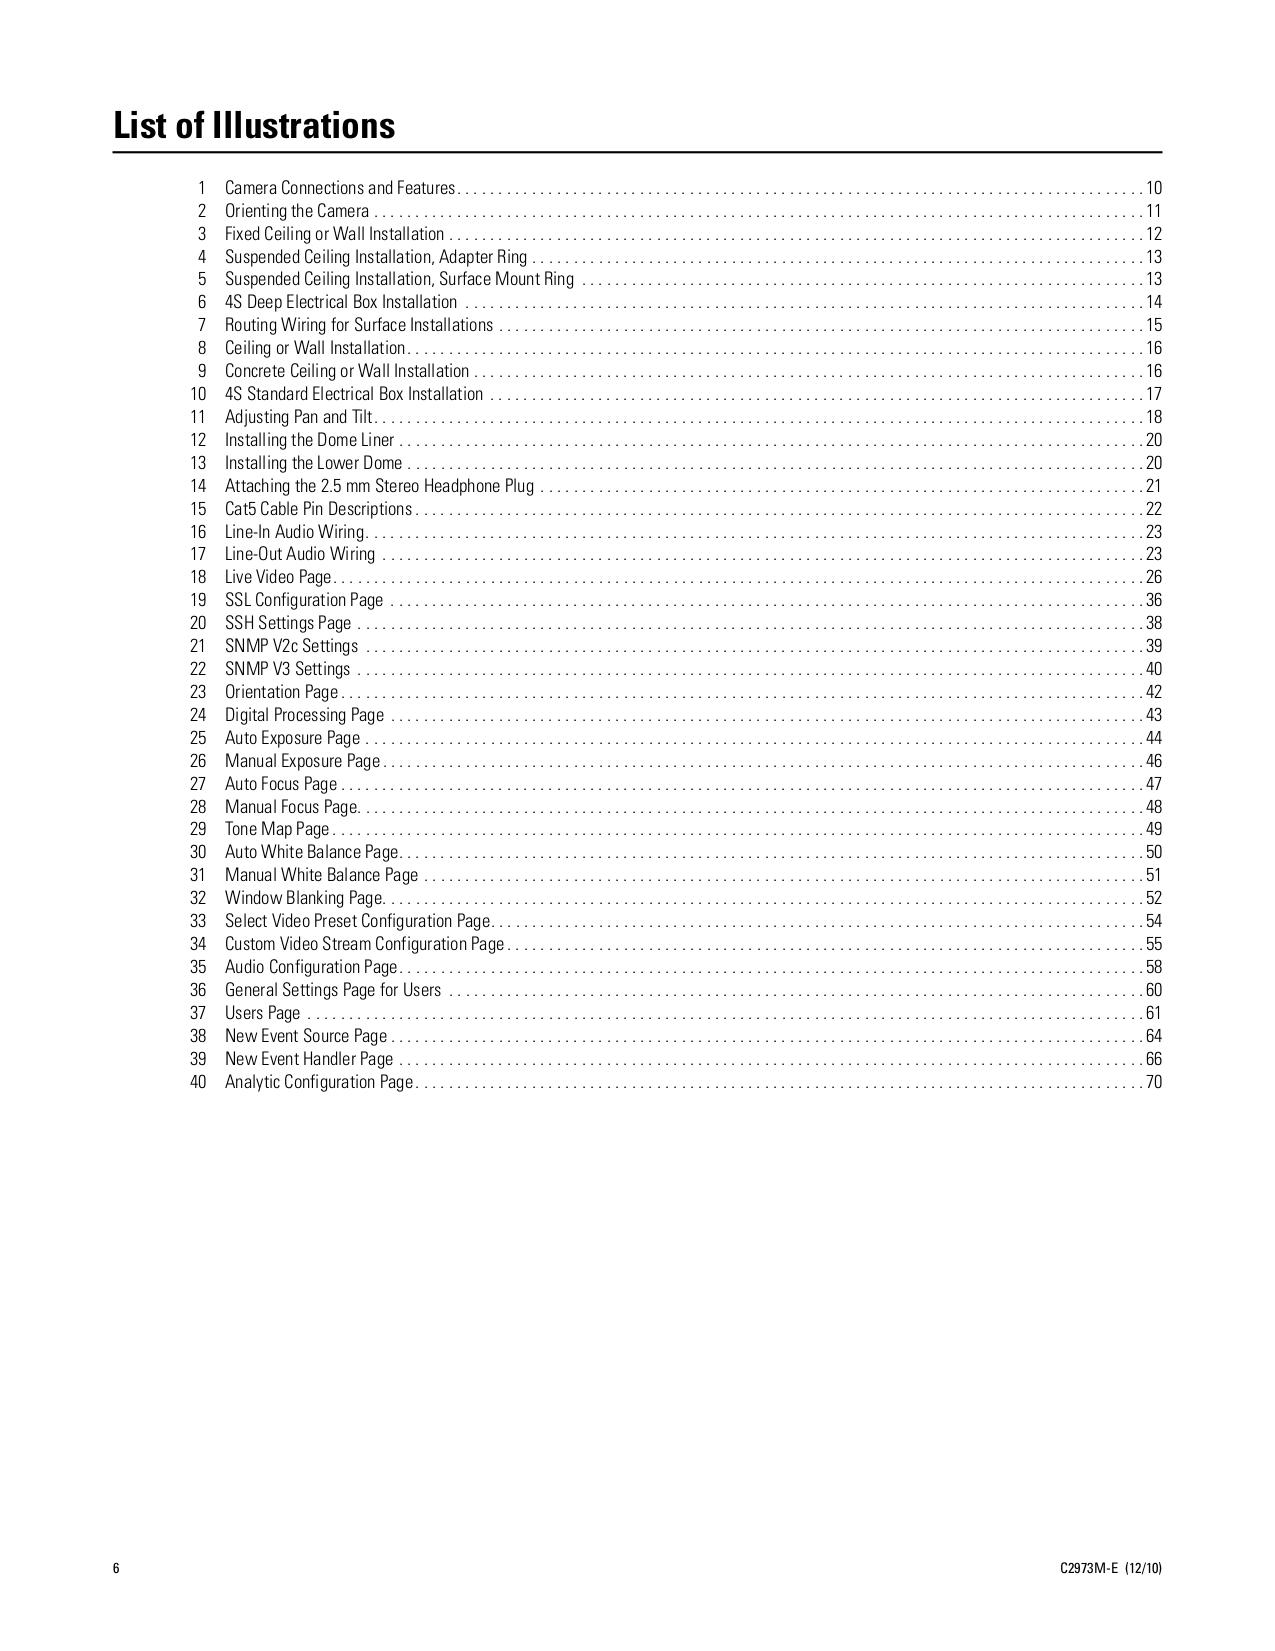 PDF manual for Pelco Security Camera IMS0 Series IMS0C10-1